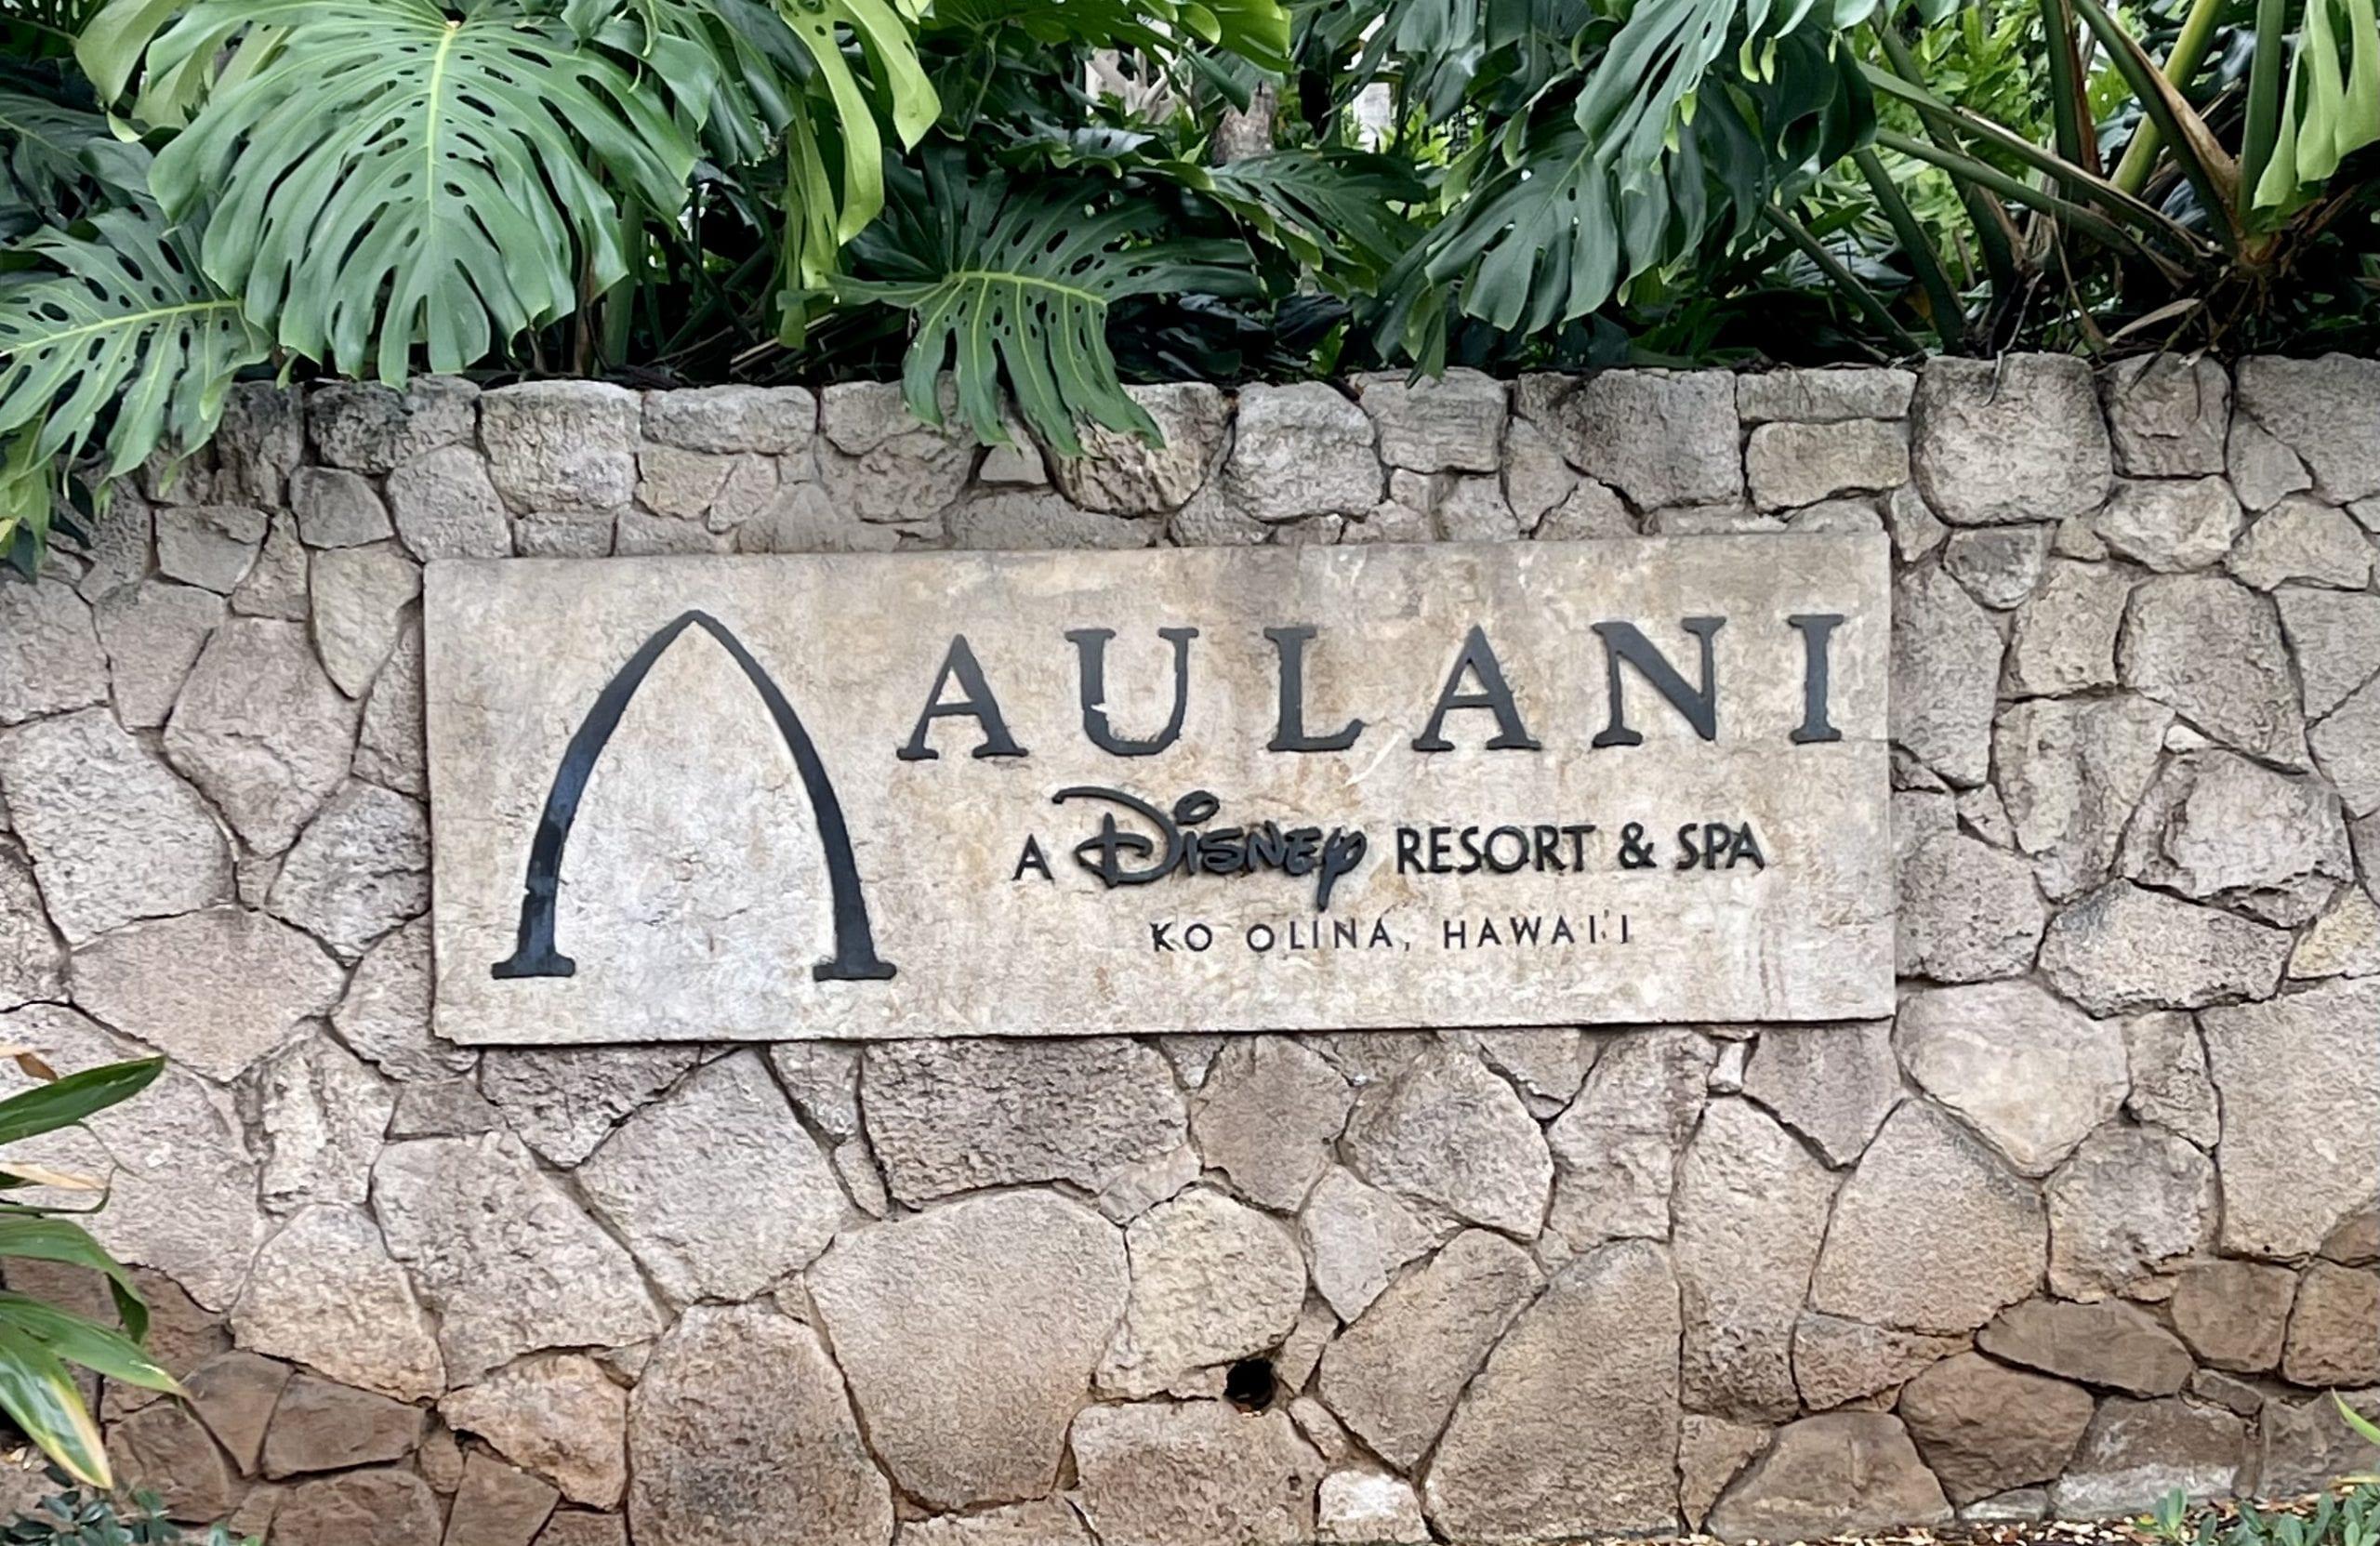 Disney's Aulani Resort & Spa